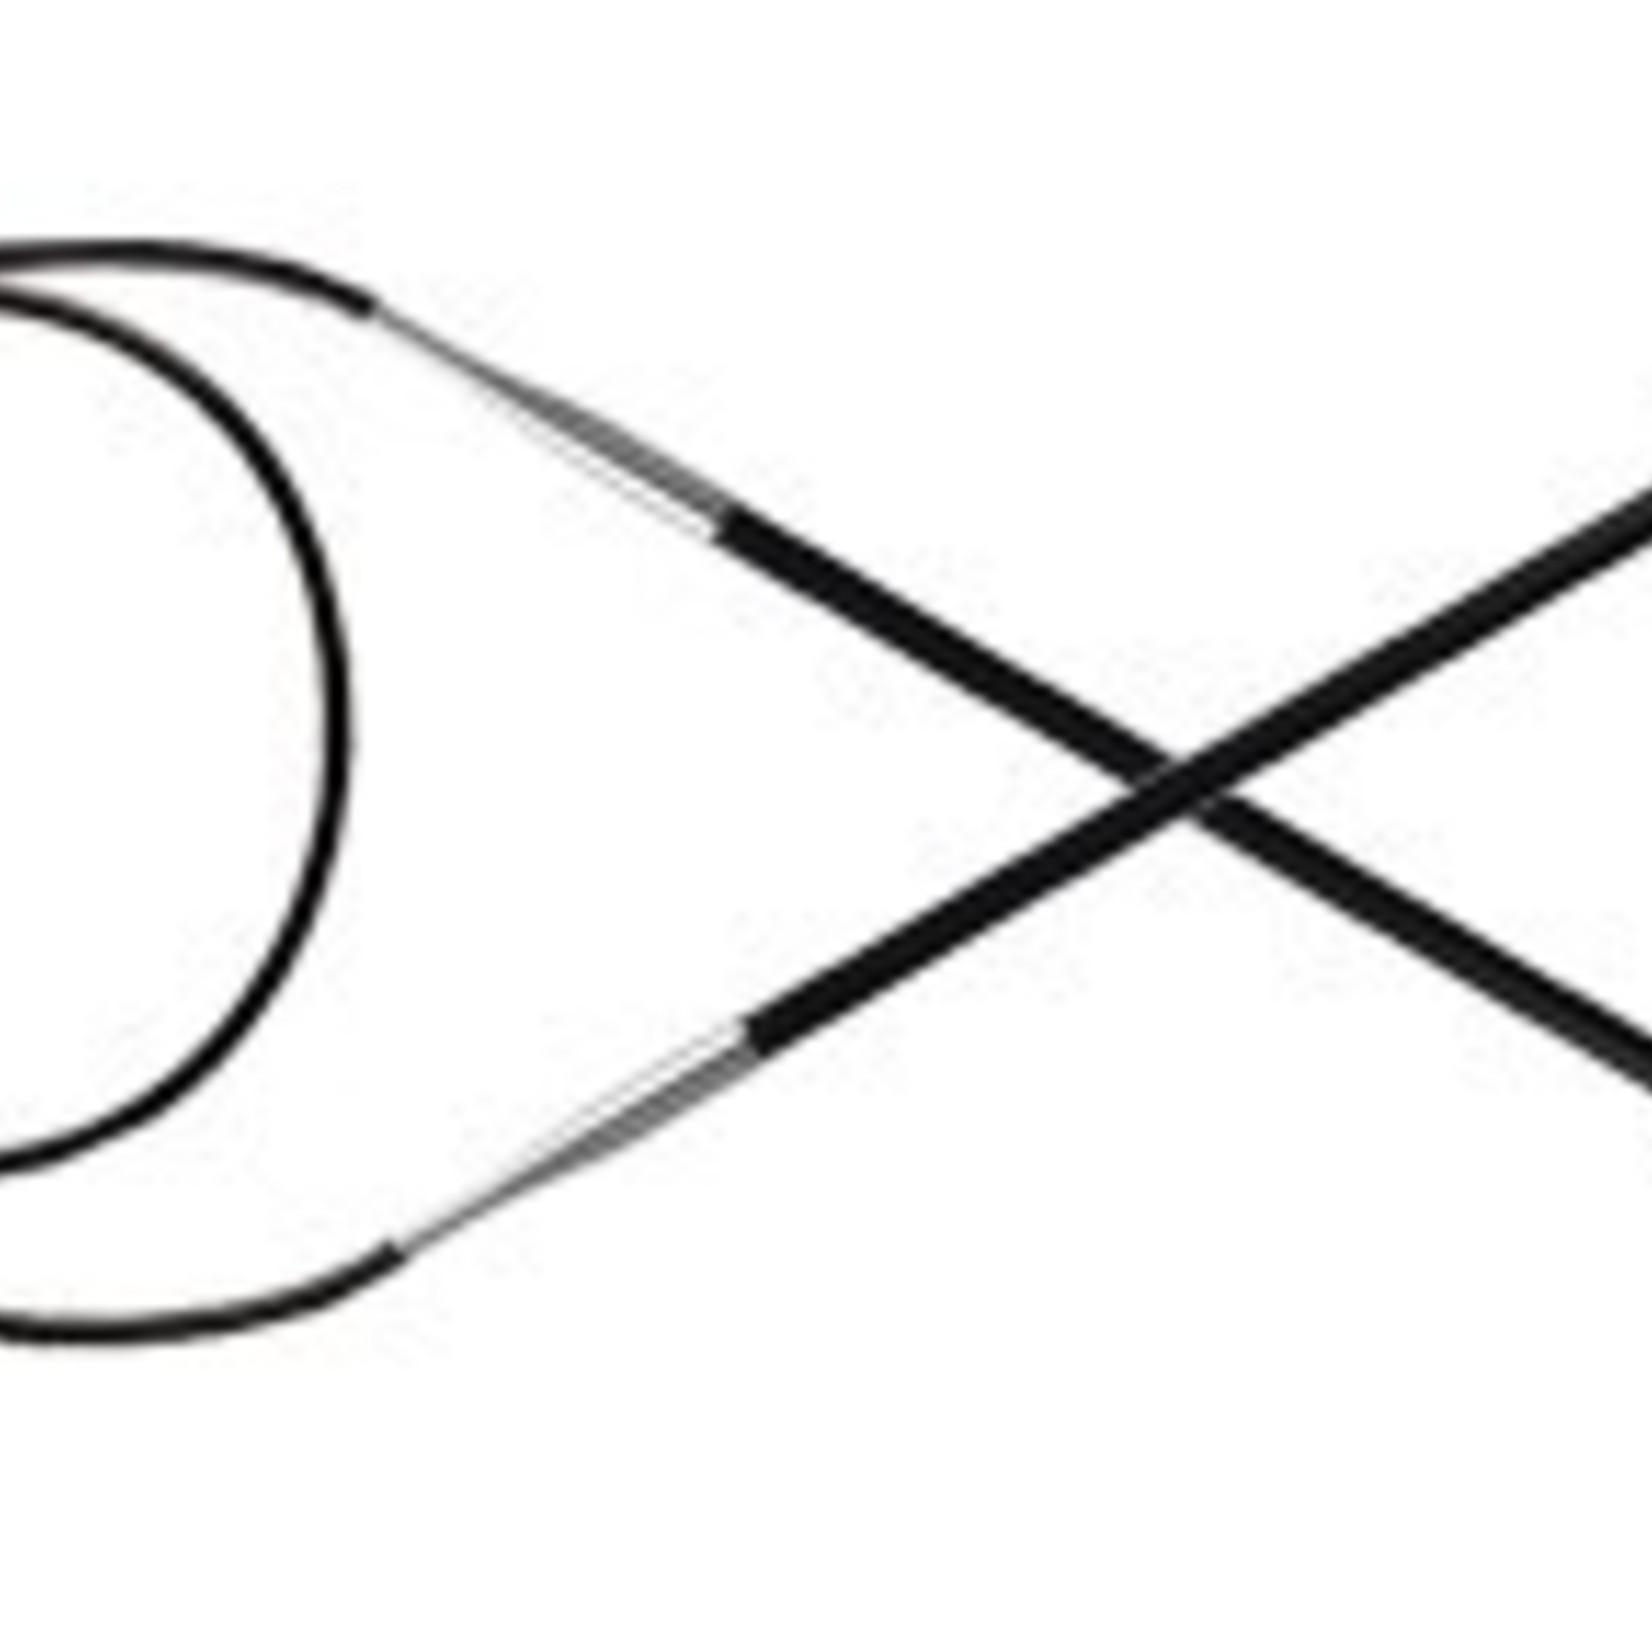 Knitter's Pride 1.5 Karbonz Circular 40